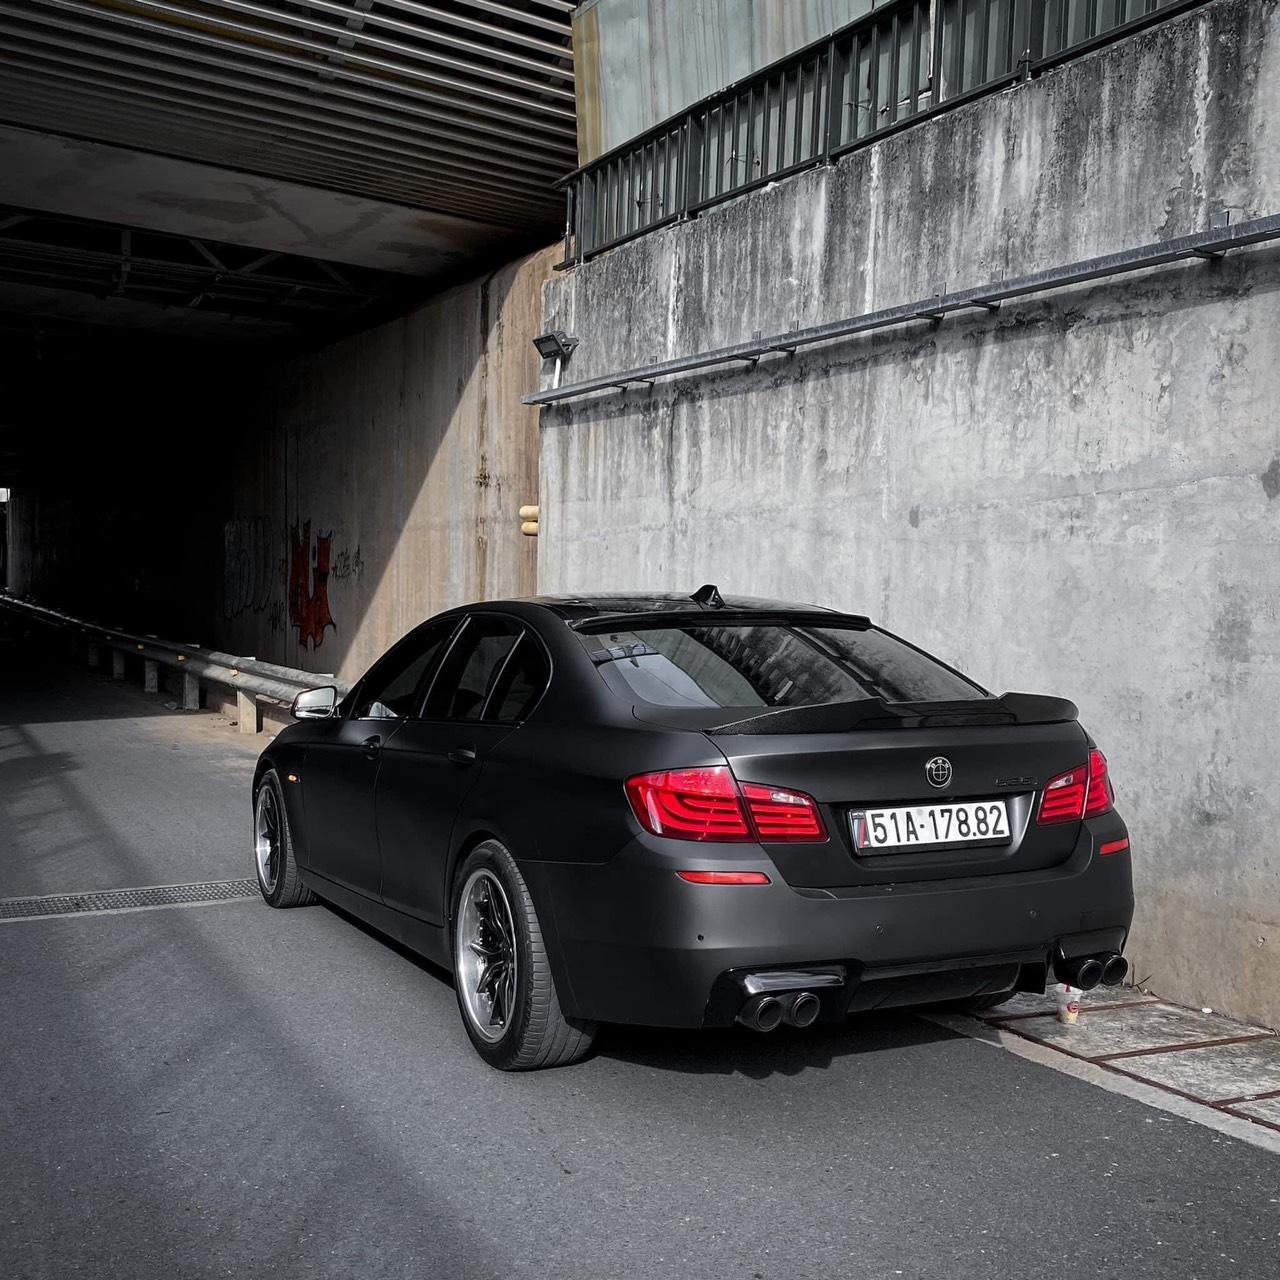 Dán Đổi Màu Xe BMW 535i Đen